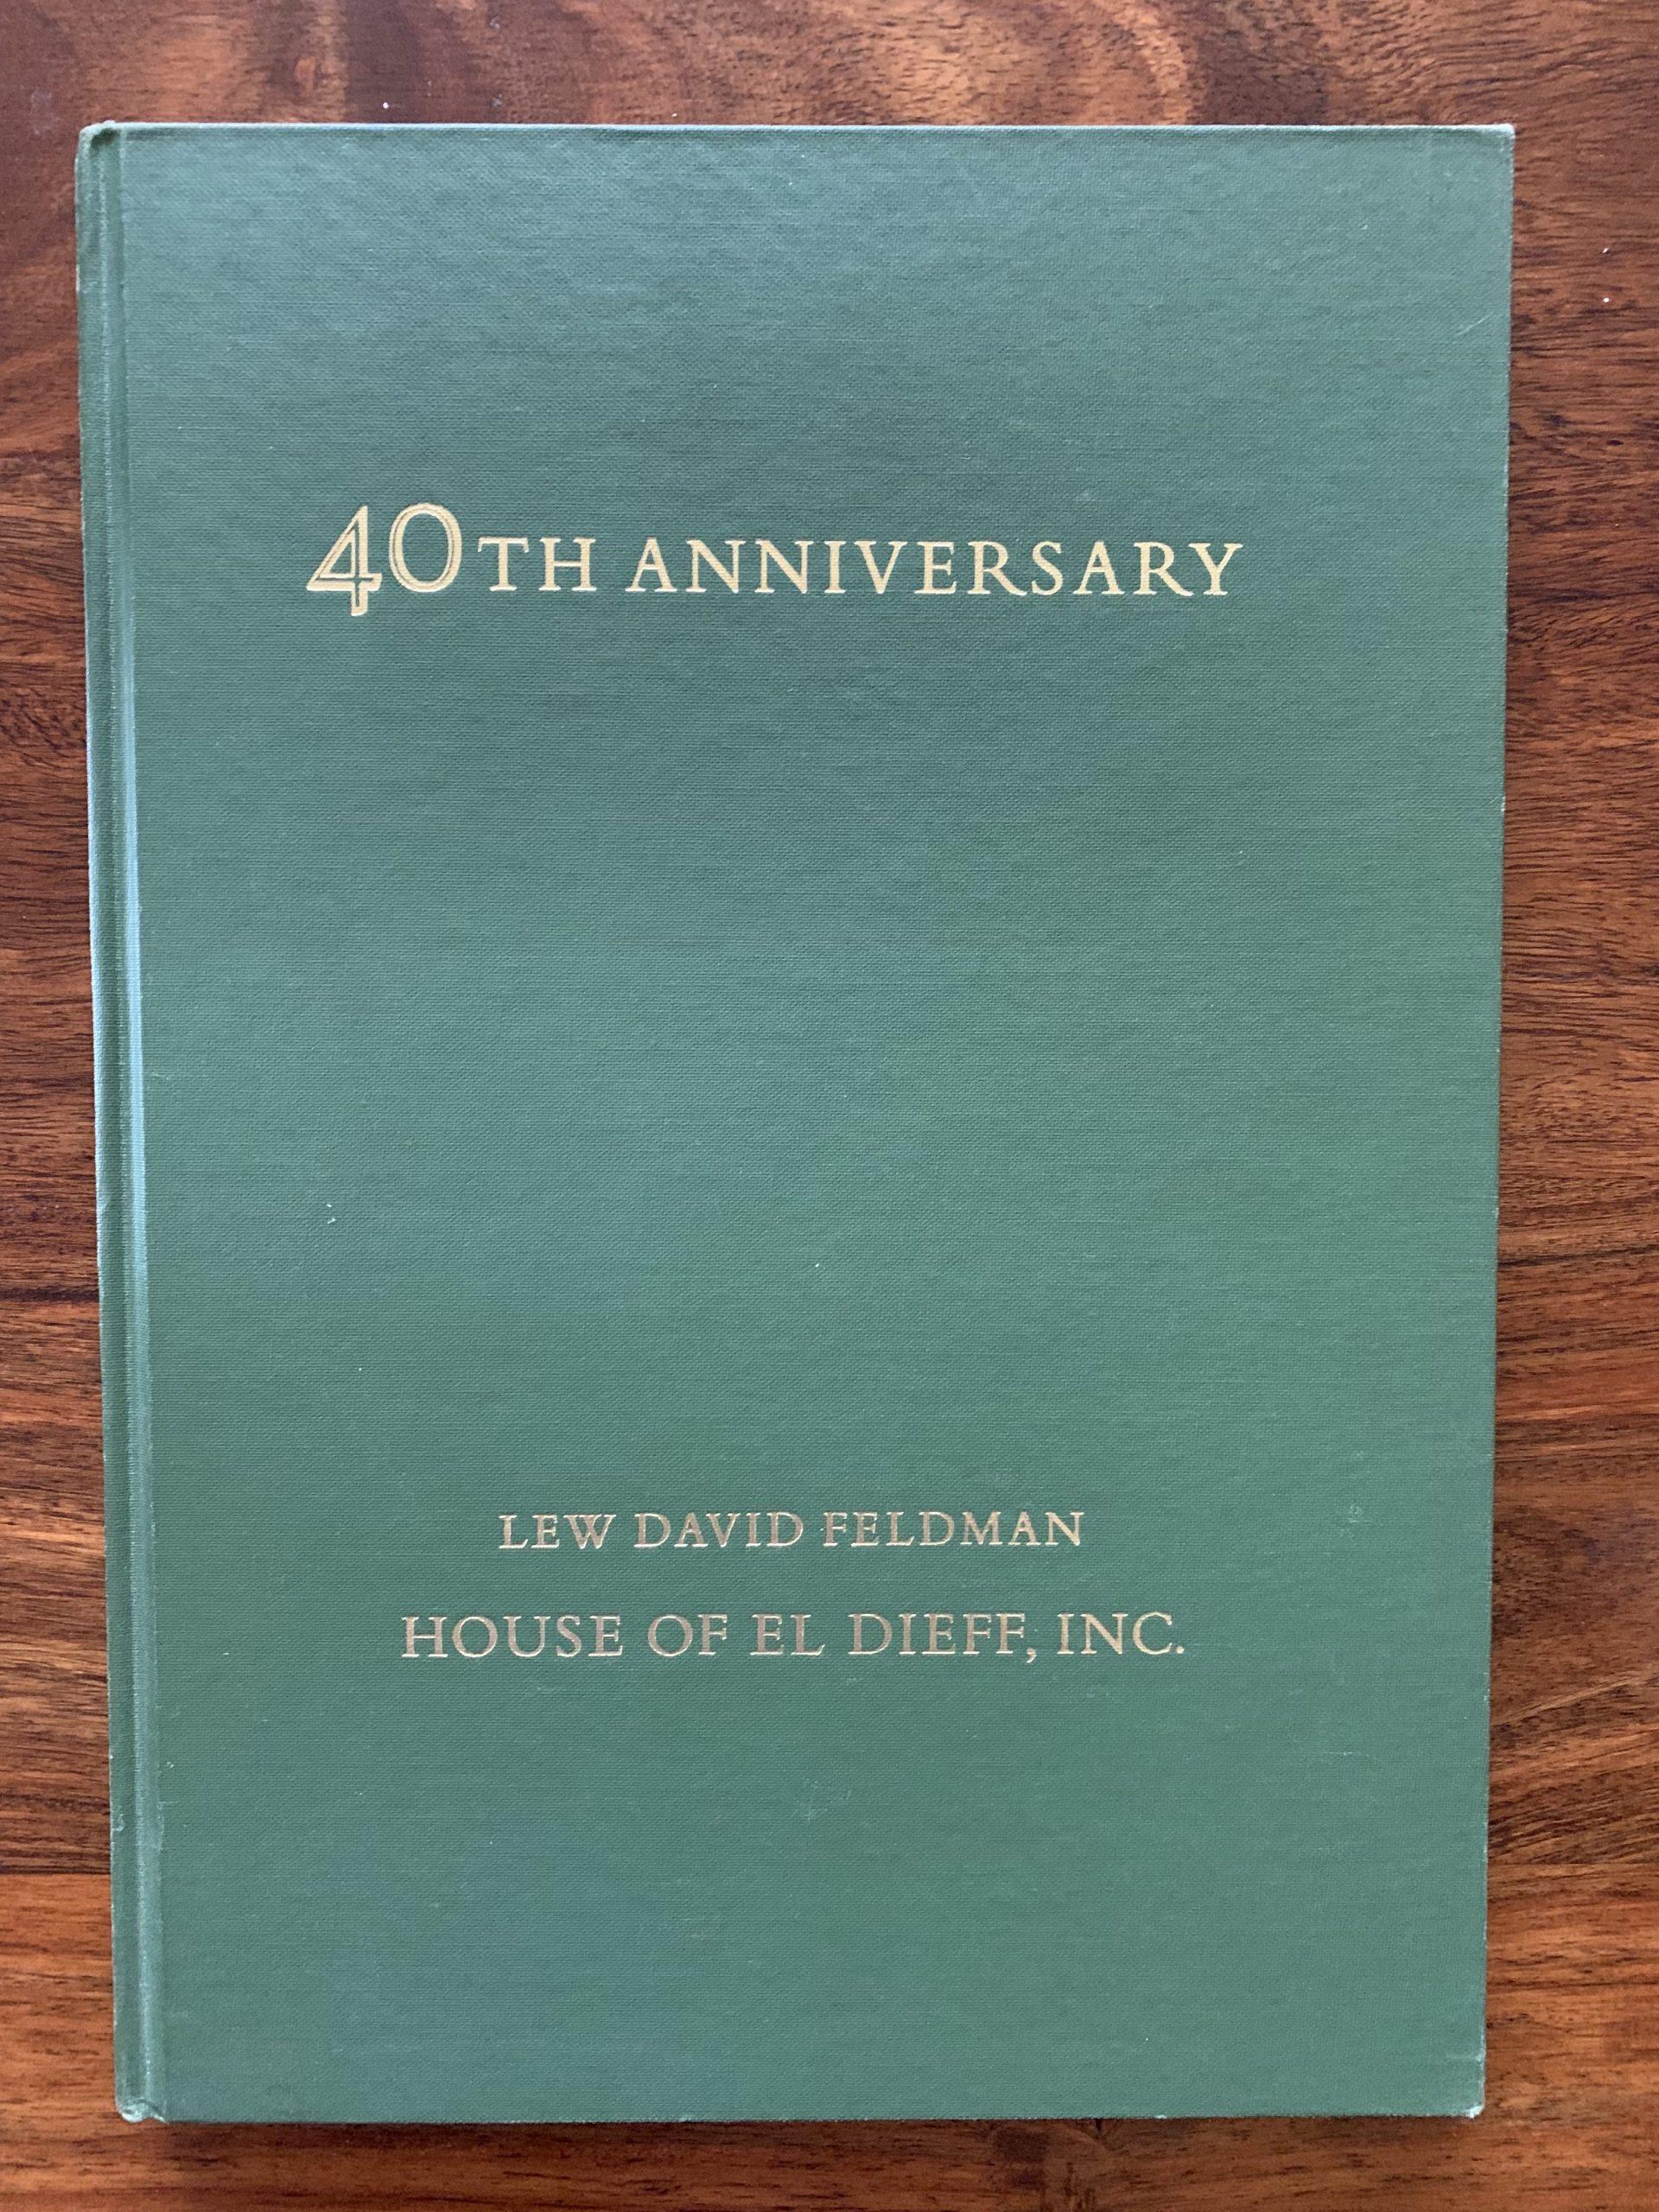 LEW DAVID FELDMAN; HOUSE OF EL DIEFF, INC